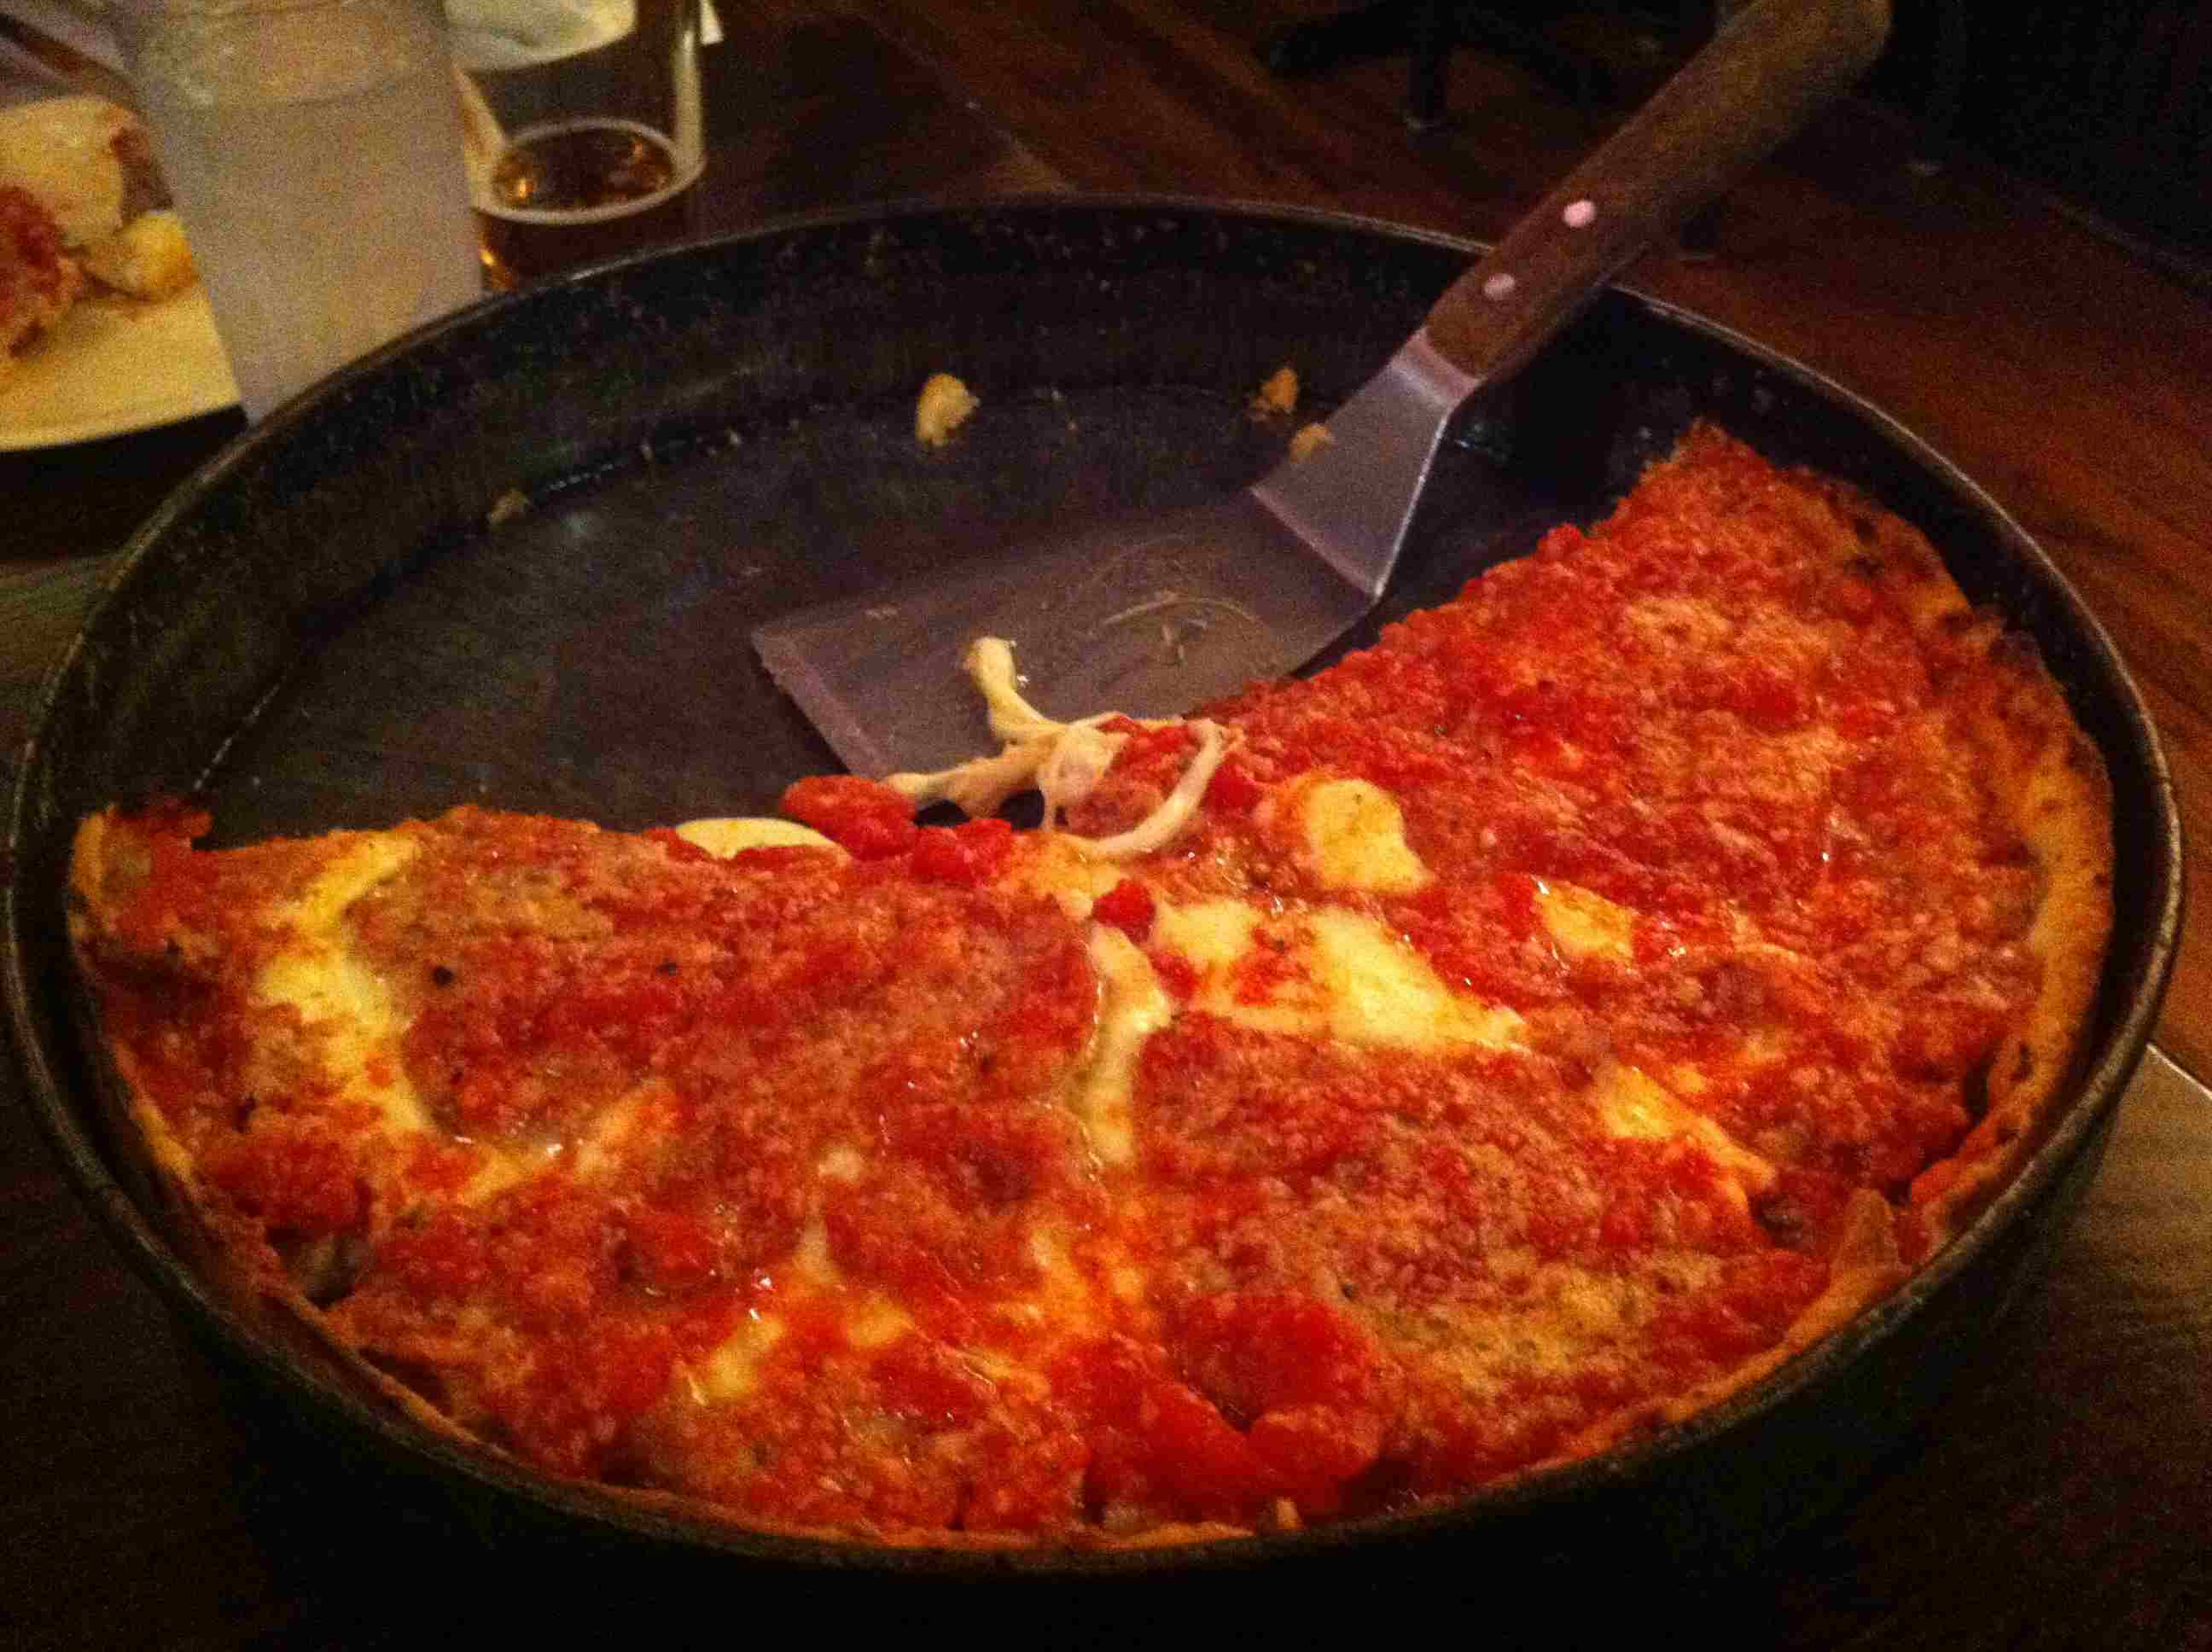 Половина глубокого блюда чикагского стиля пиццы от пиццерии Лу Malnati в